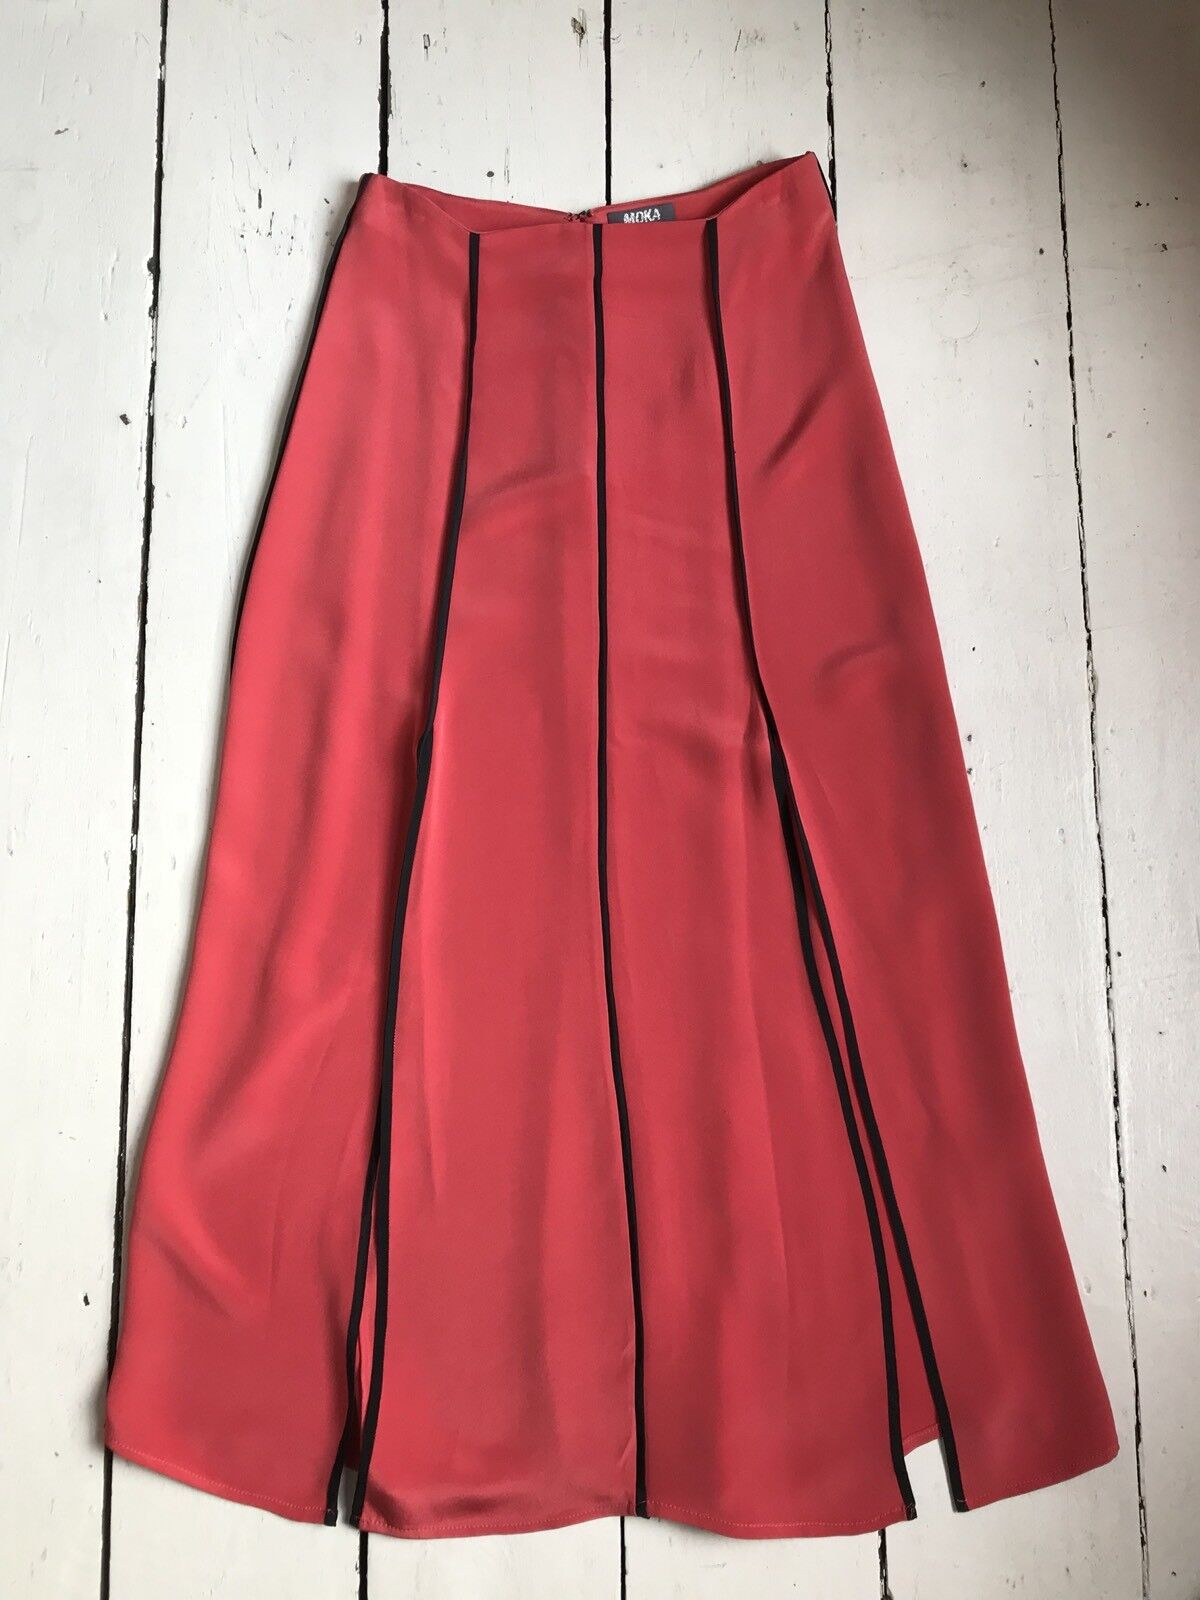 Coral Silk Maxi Skirt Size Small Moka London